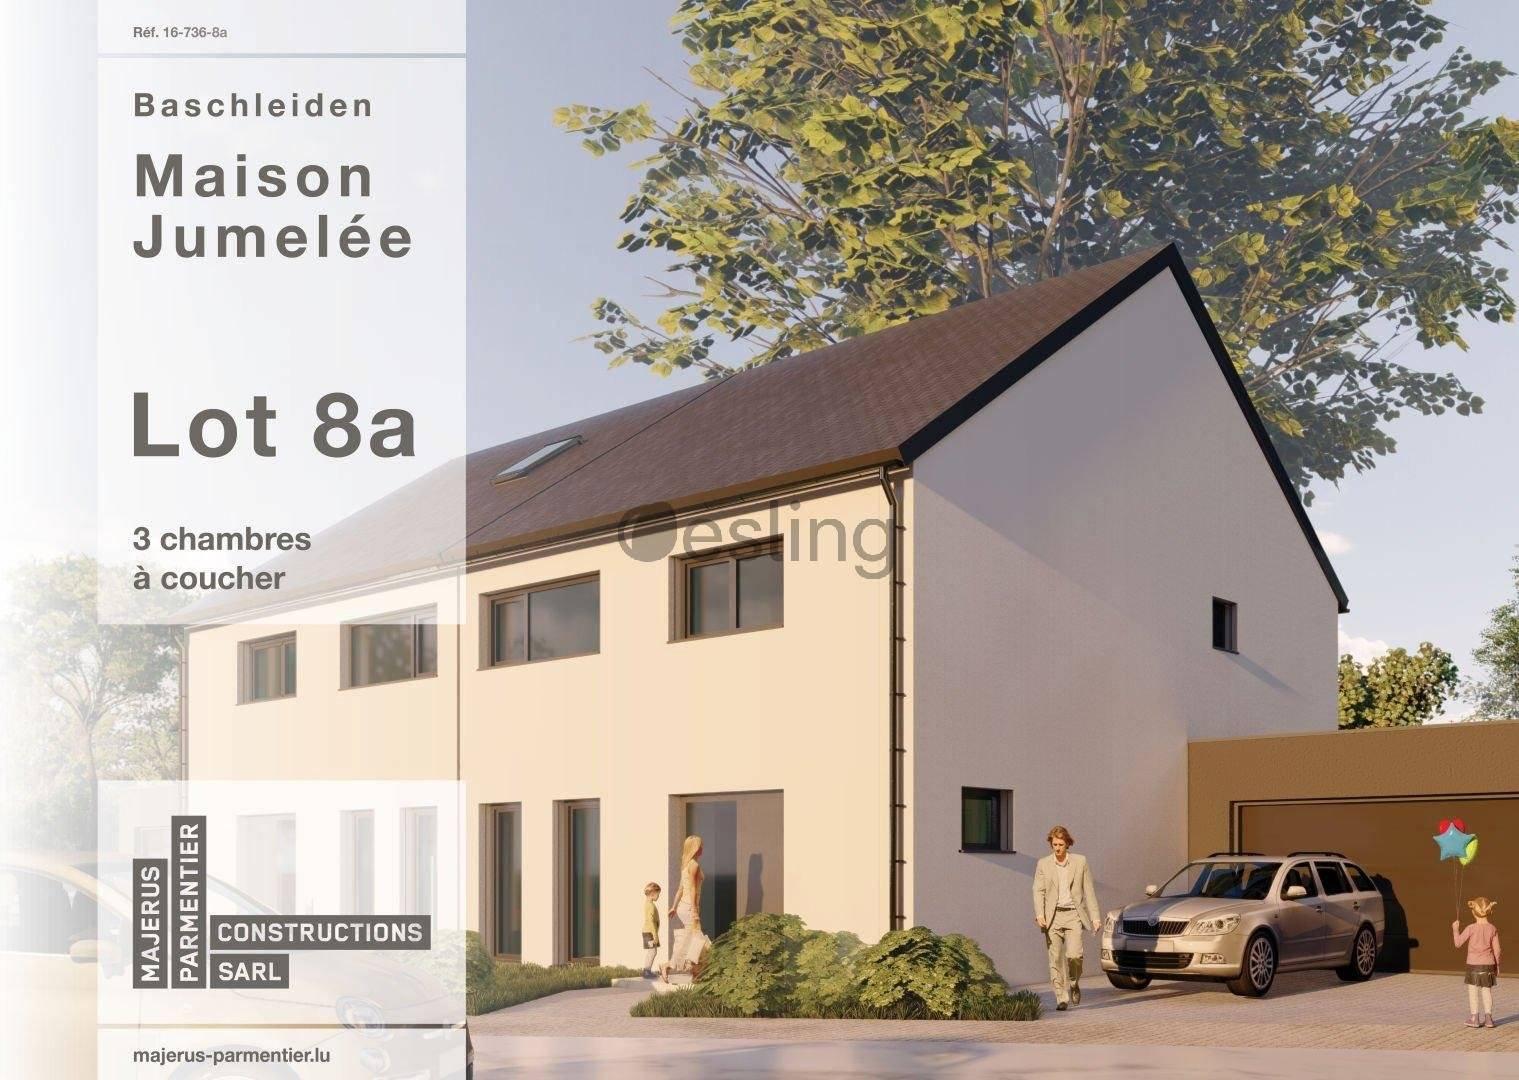 Sale Semi-detached house Baschleiden